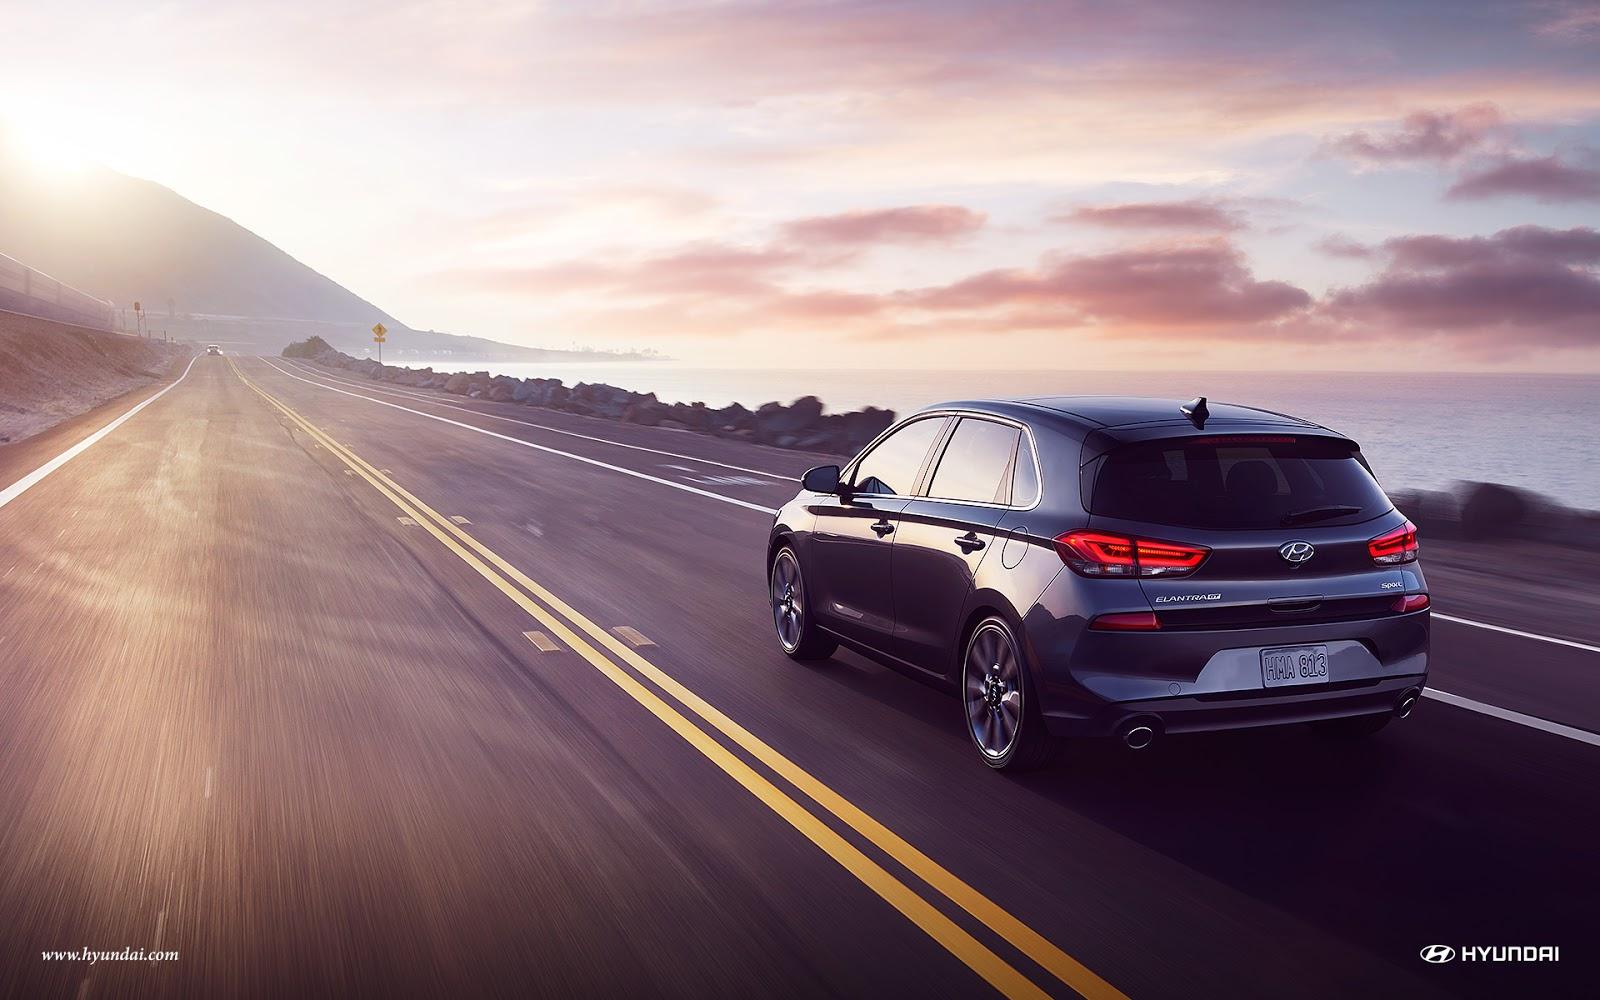 Hyundai Elantra mới 2019